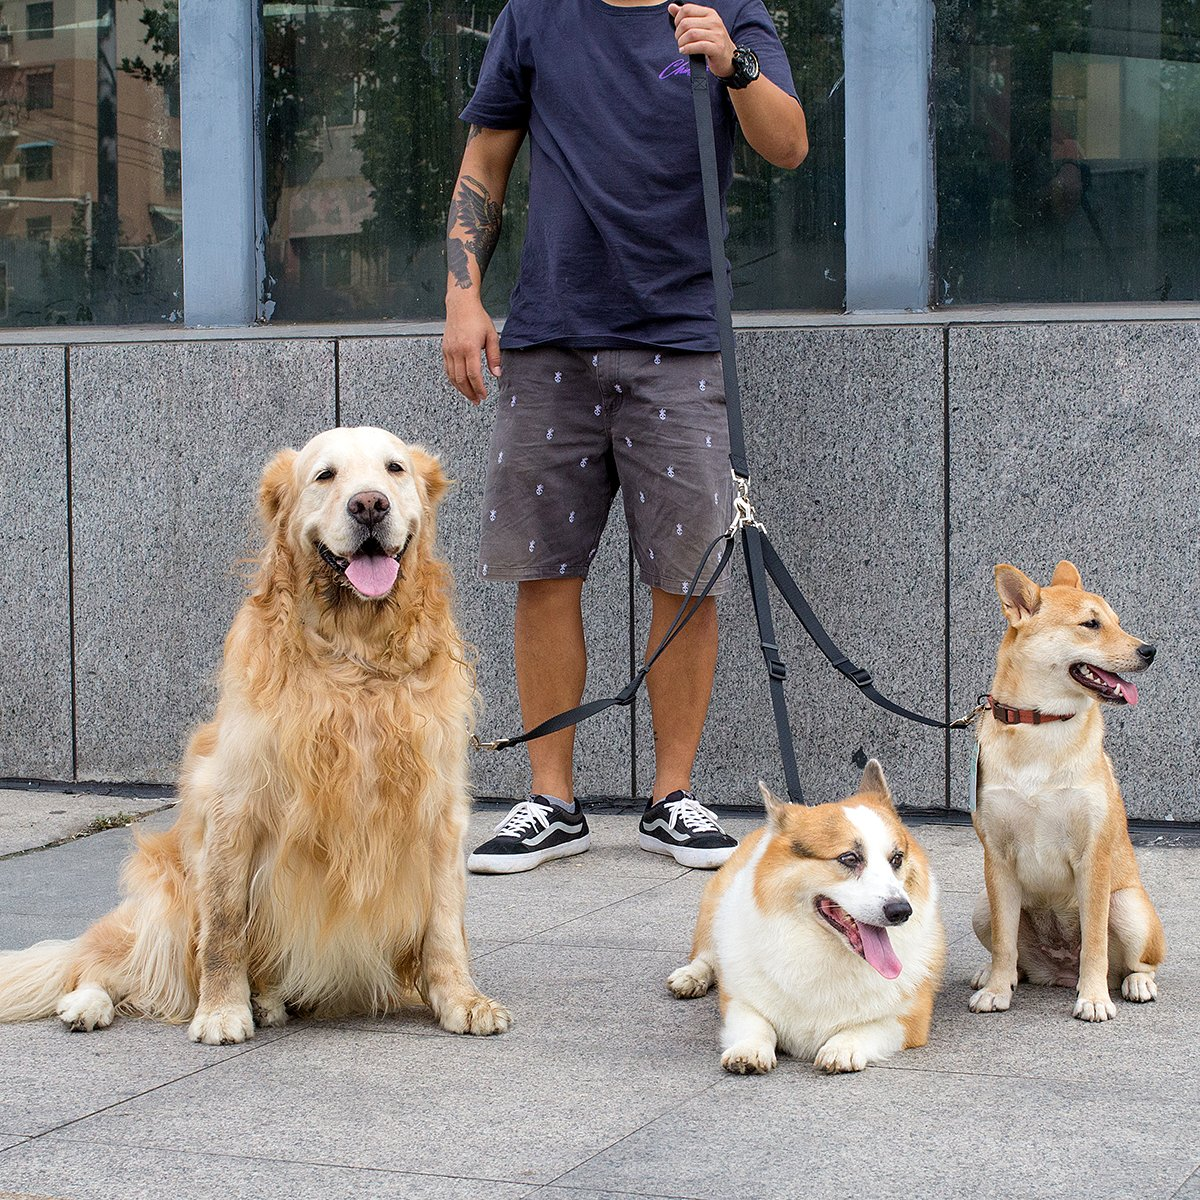 MEWTOGO Adjustable Pet Dog Leash Coupler-no Tangle Triple Nylon Puppy Leash for Walking and Training